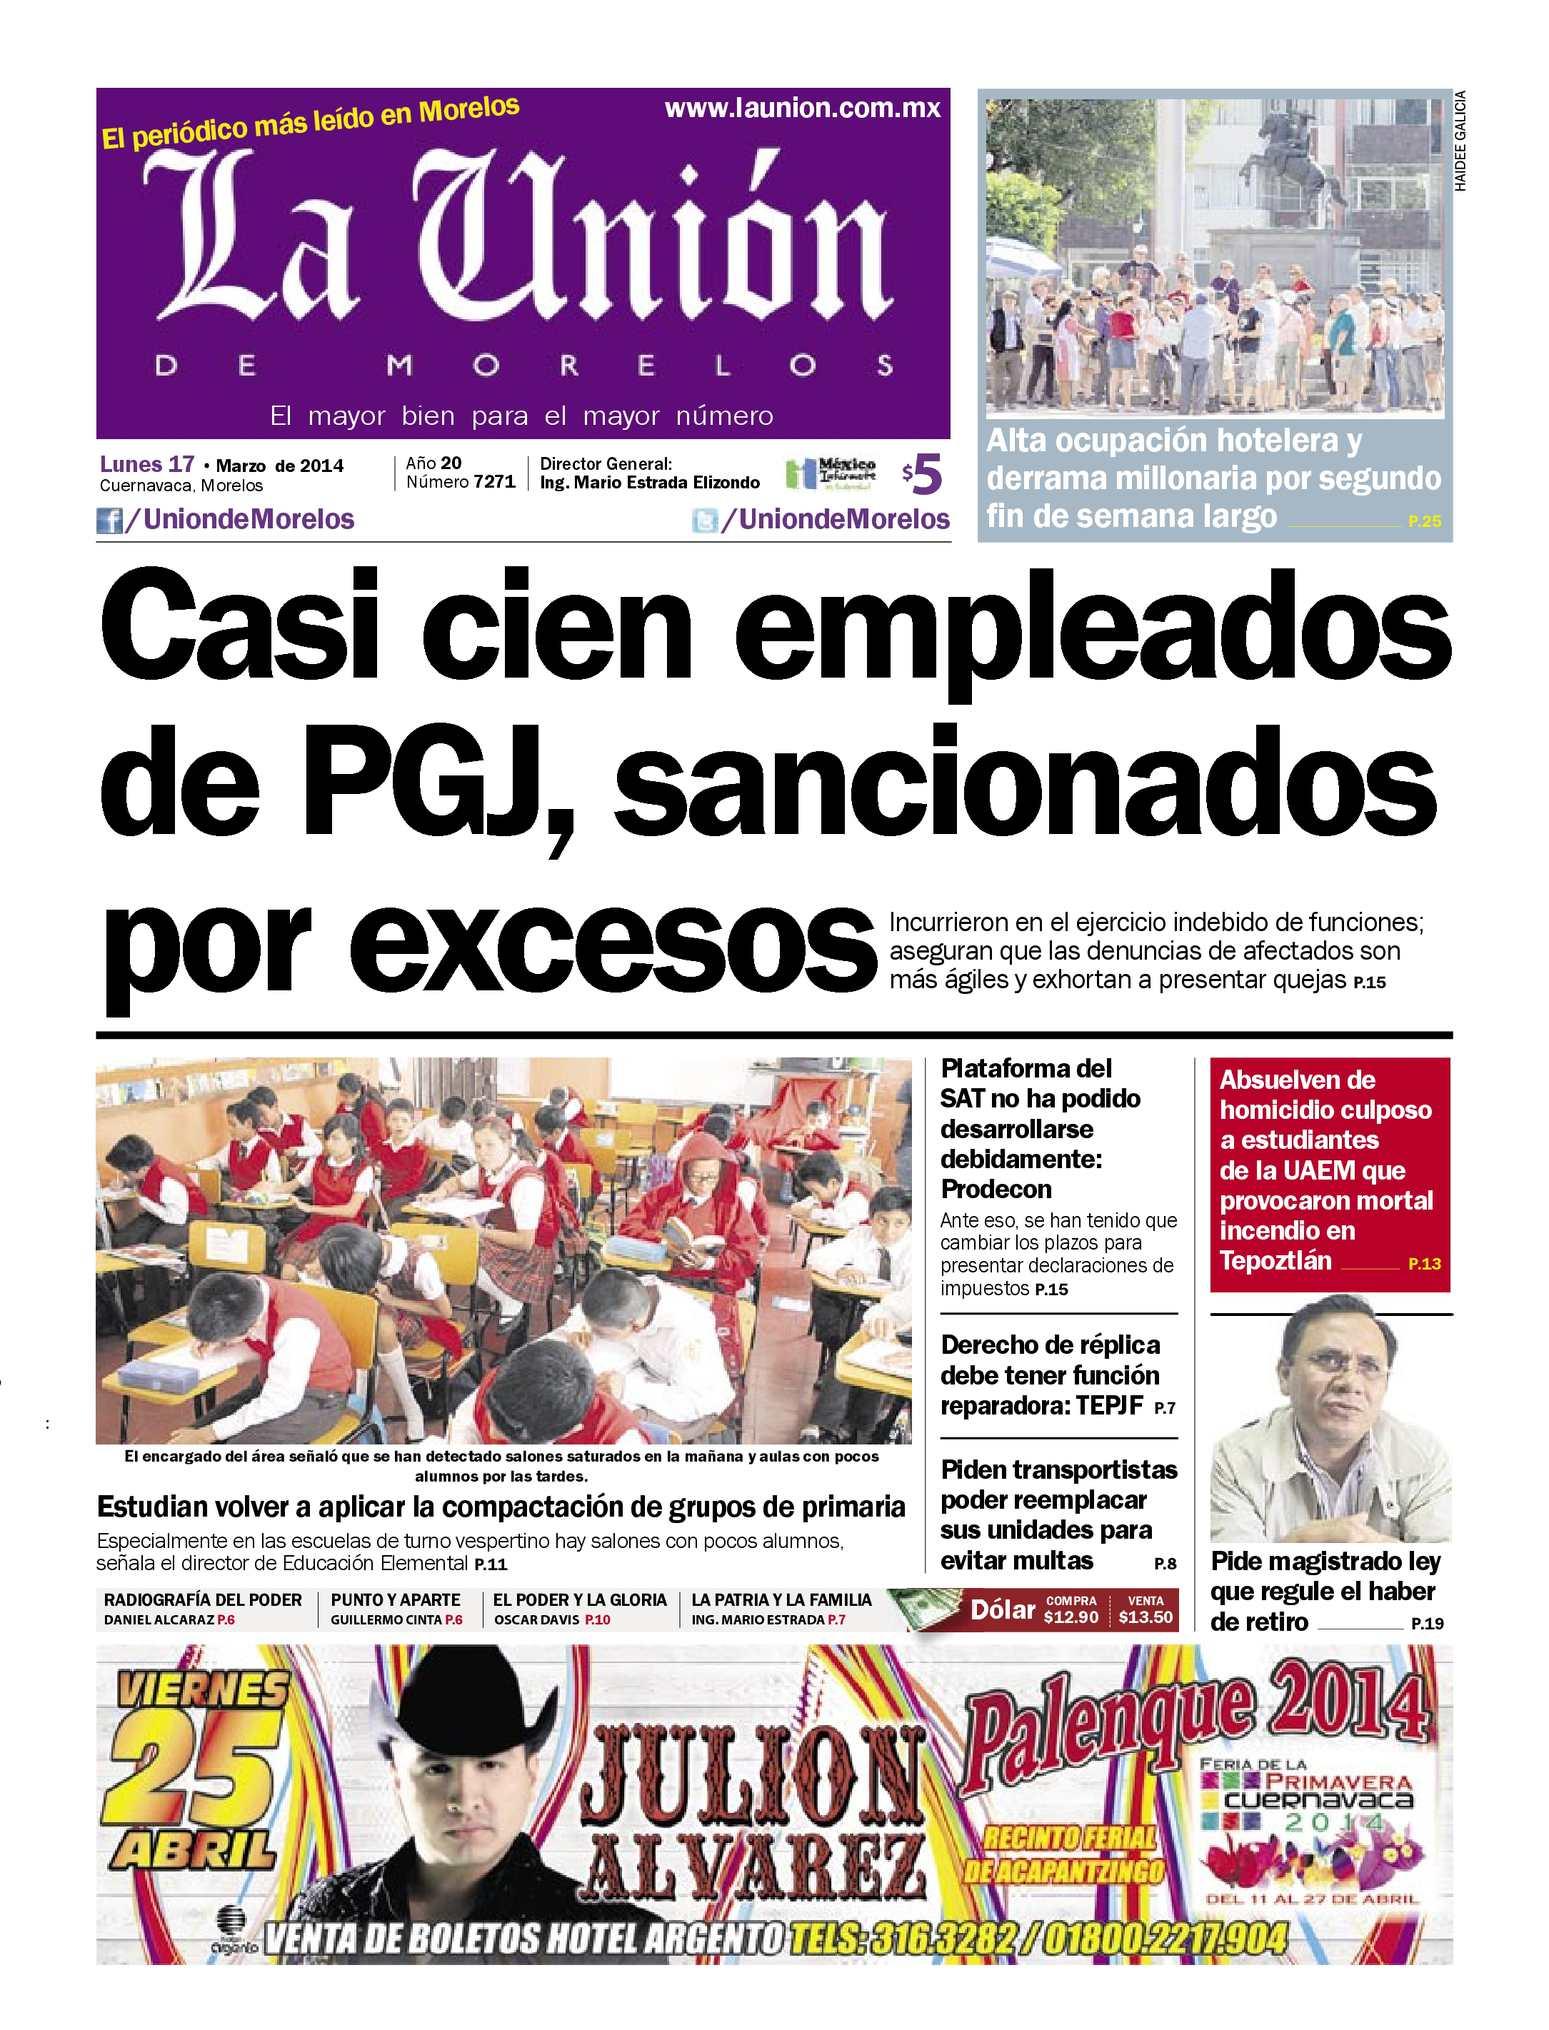 Cariñosa En Ingles Santiago De Querétaro